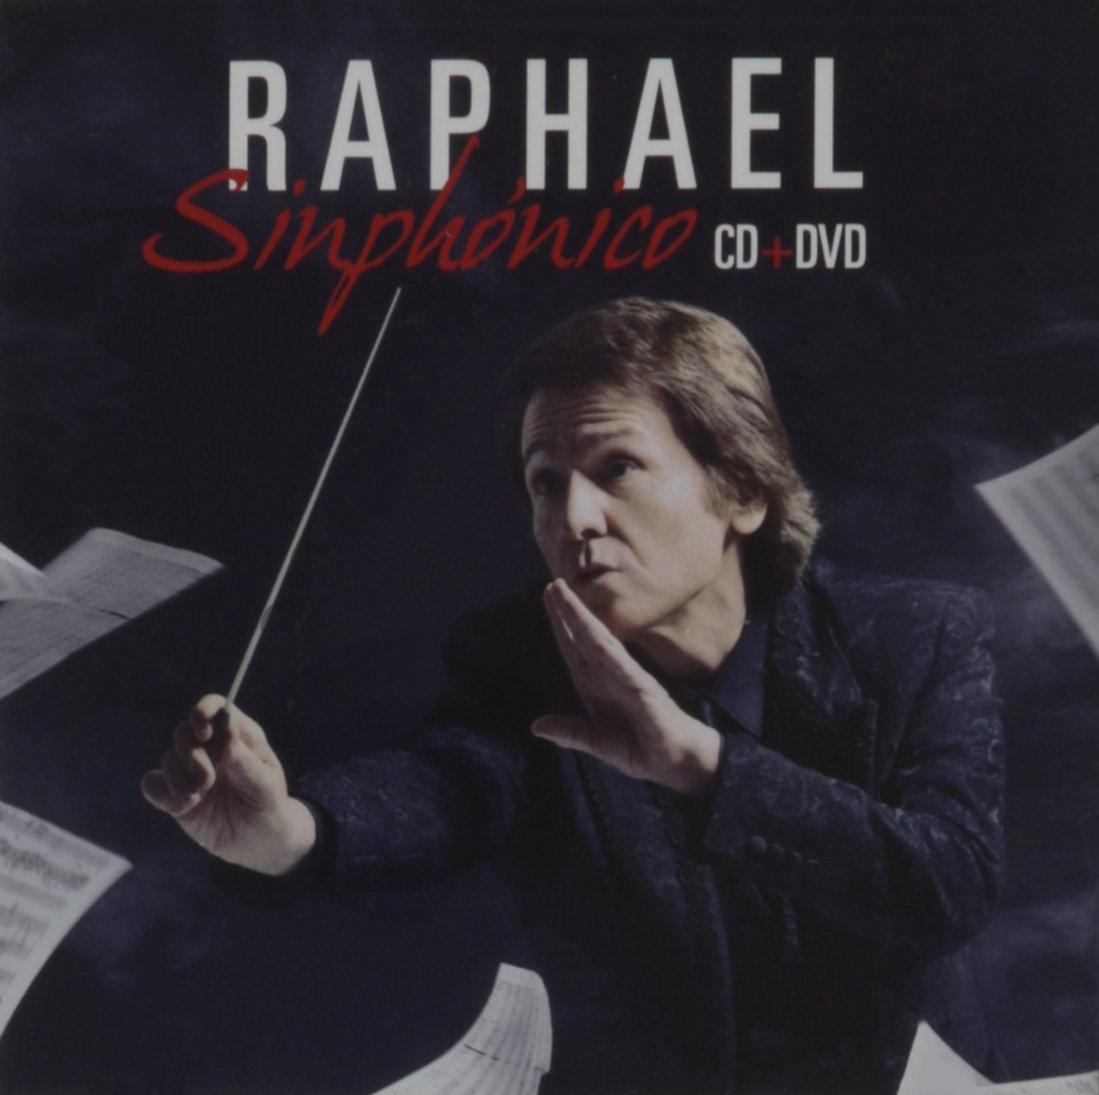 Sinph¢nico [CD/DVD Combo] by Universal Music Latino